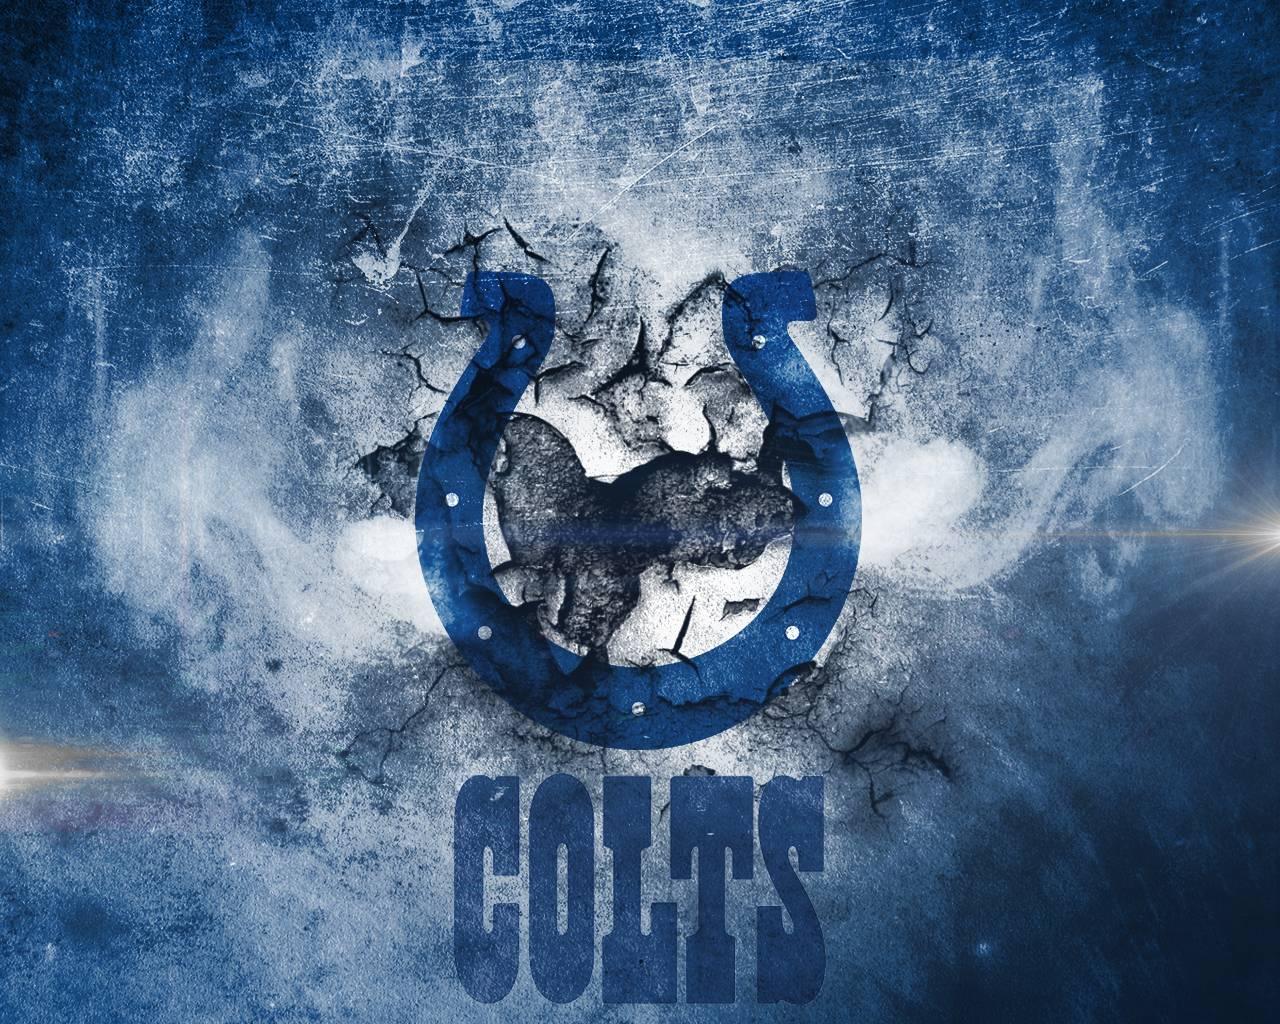 Choosing Your Colts wallpaper design ideas